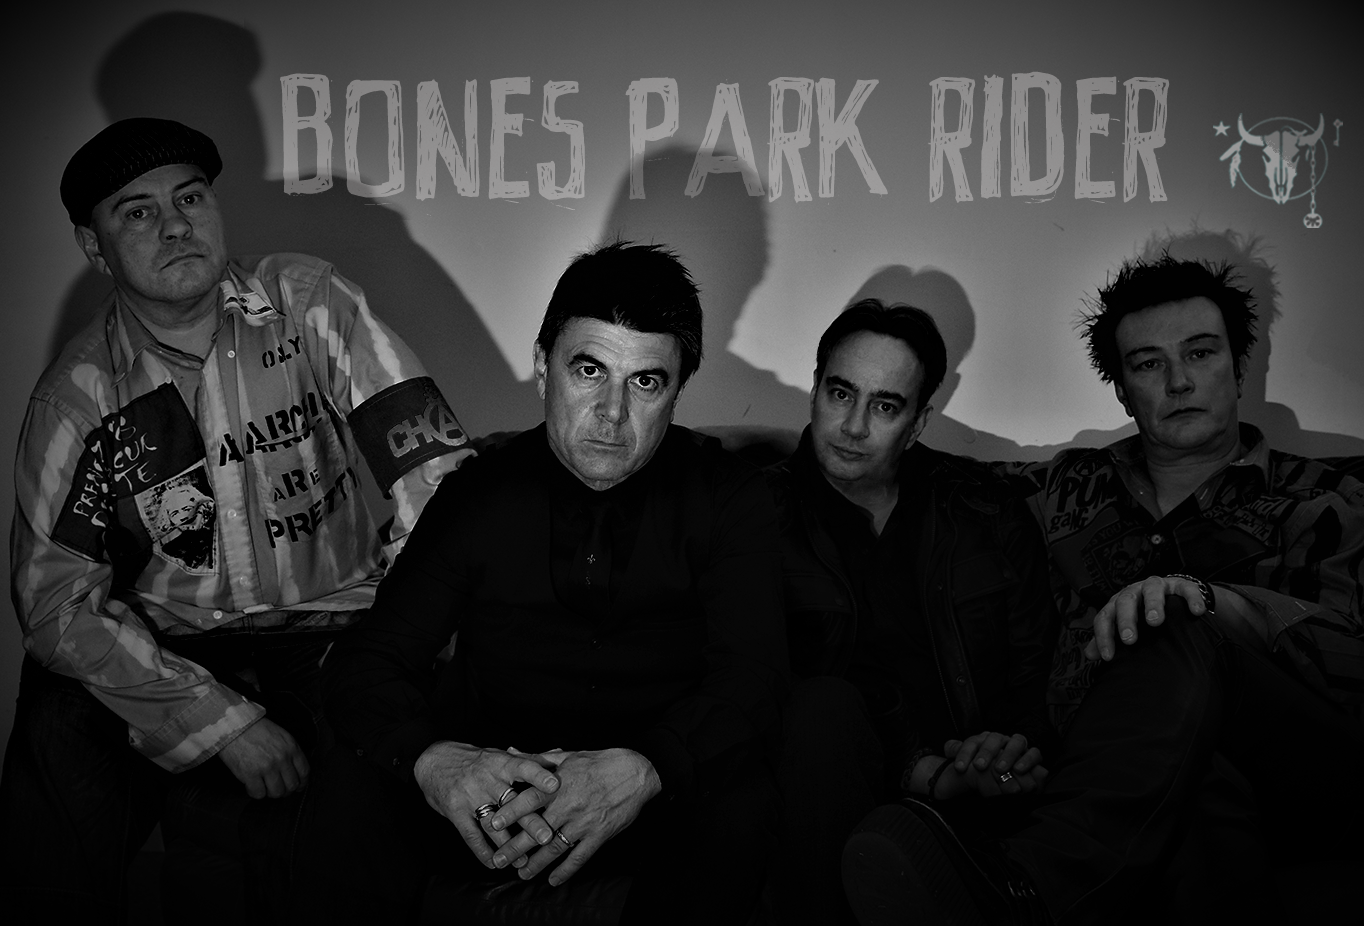 BONES PARK RIDER - photo credit Ian Beck